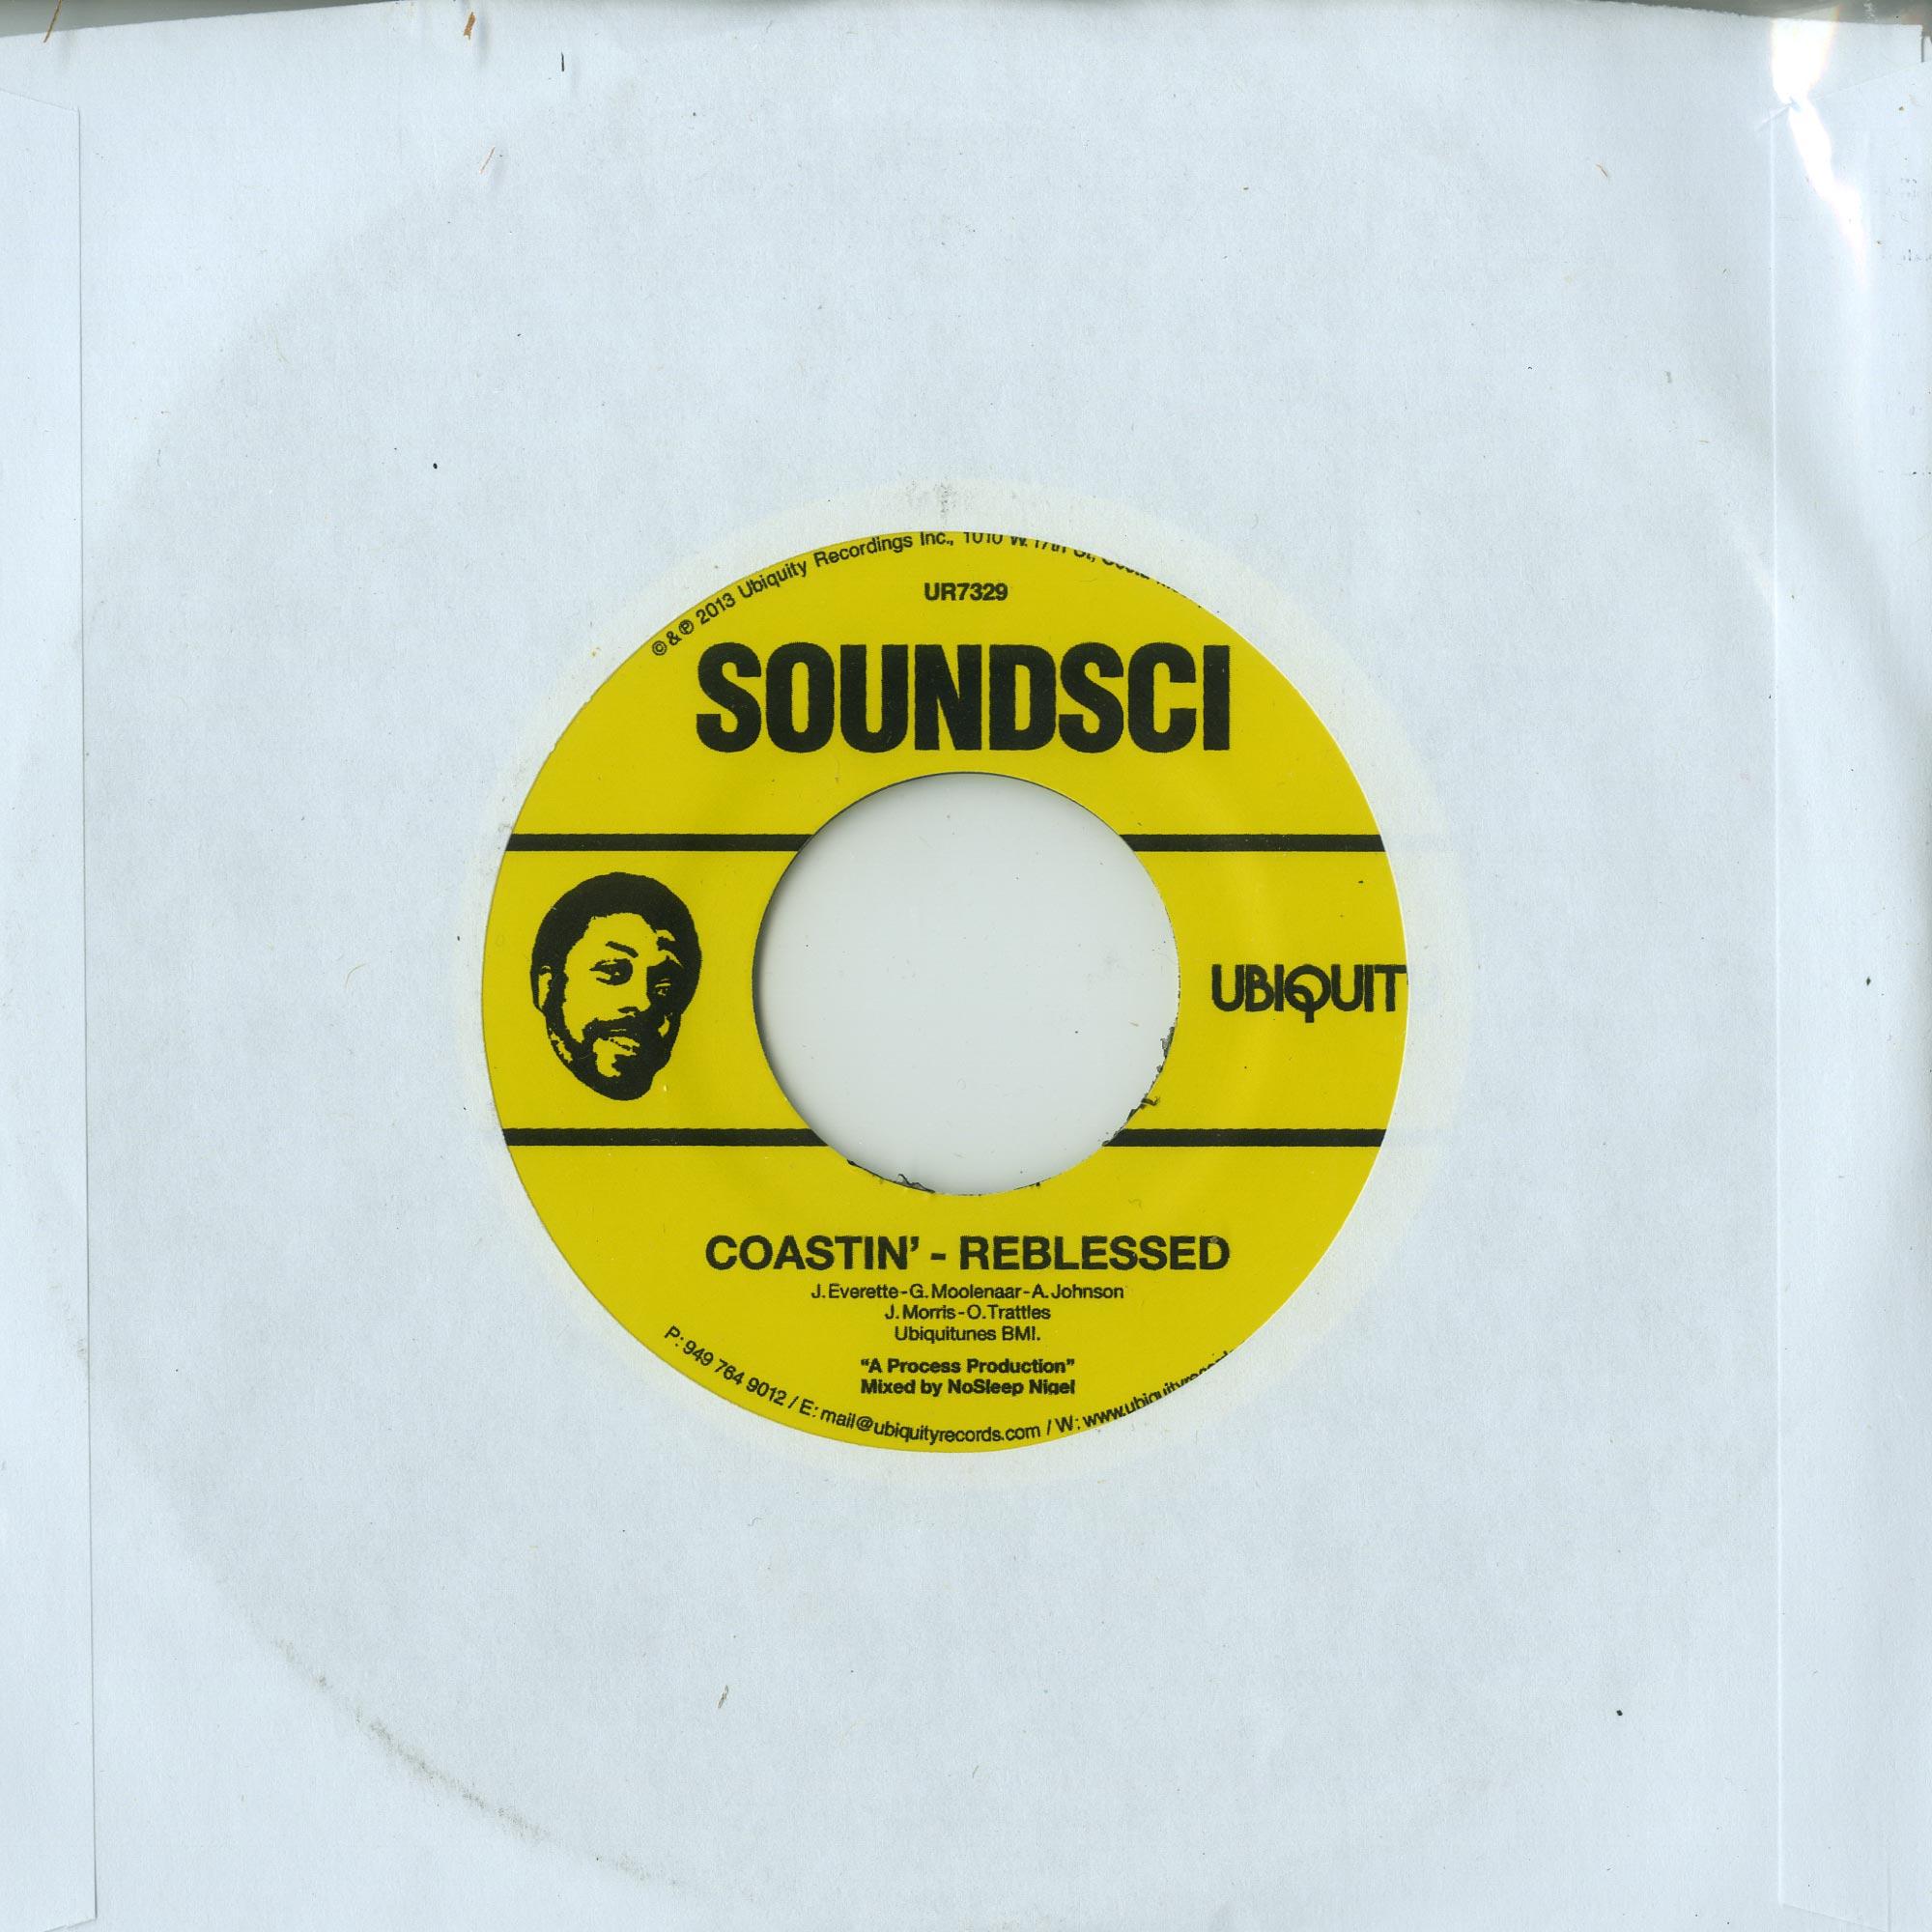 Soundsci - STYLES DUB / COASTIN REBLESSED